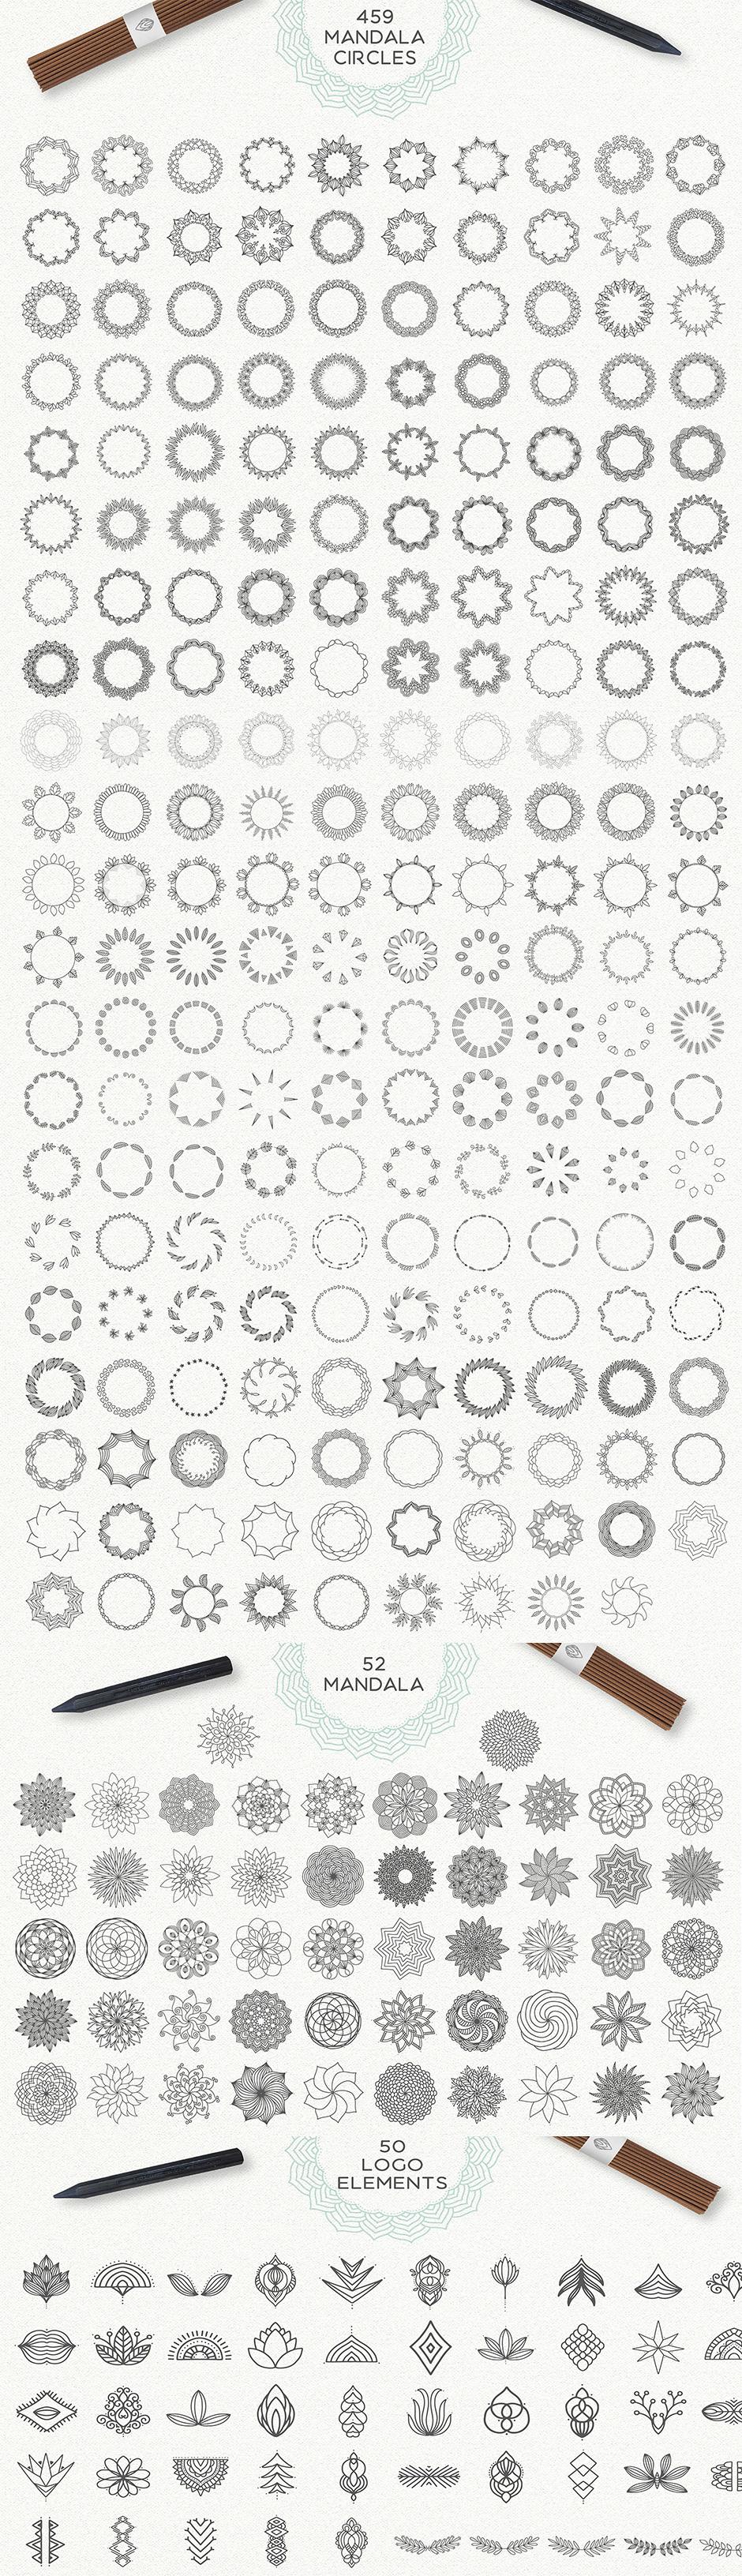 Mandala Vektor Illustrationen zum Download